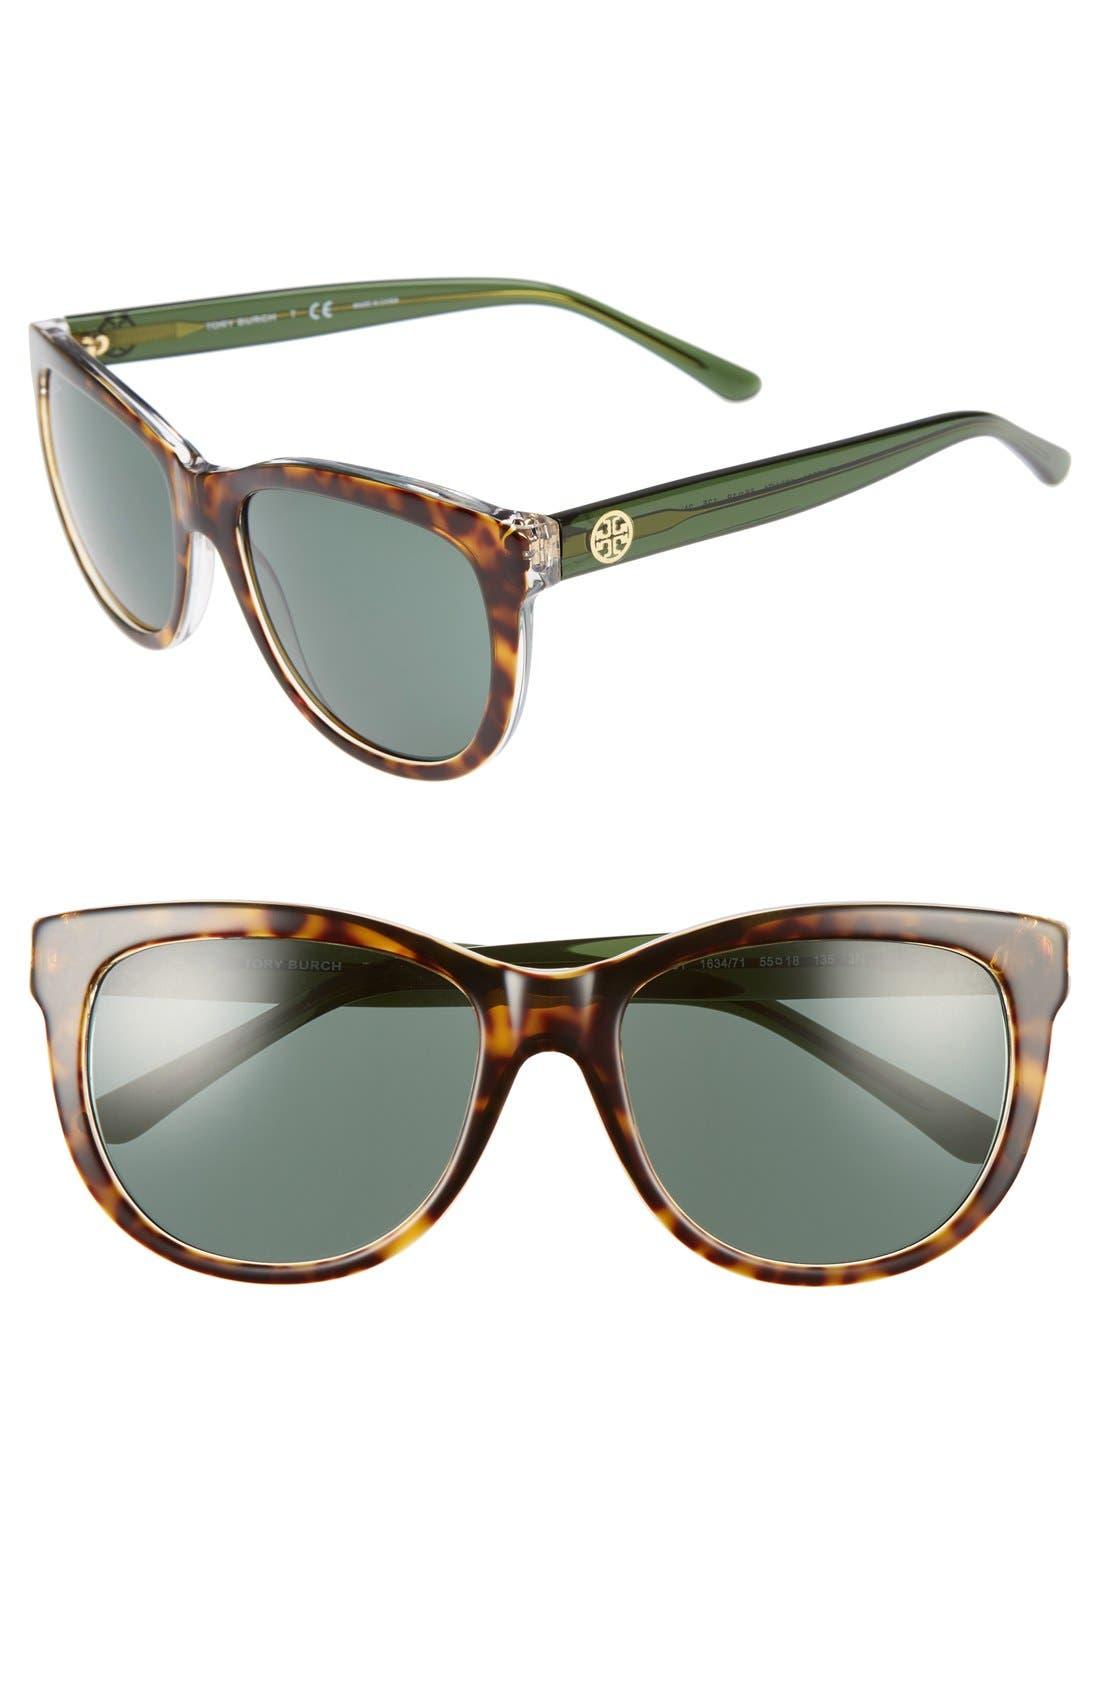 55mm Sunglasses,                         Main,                         color, 300